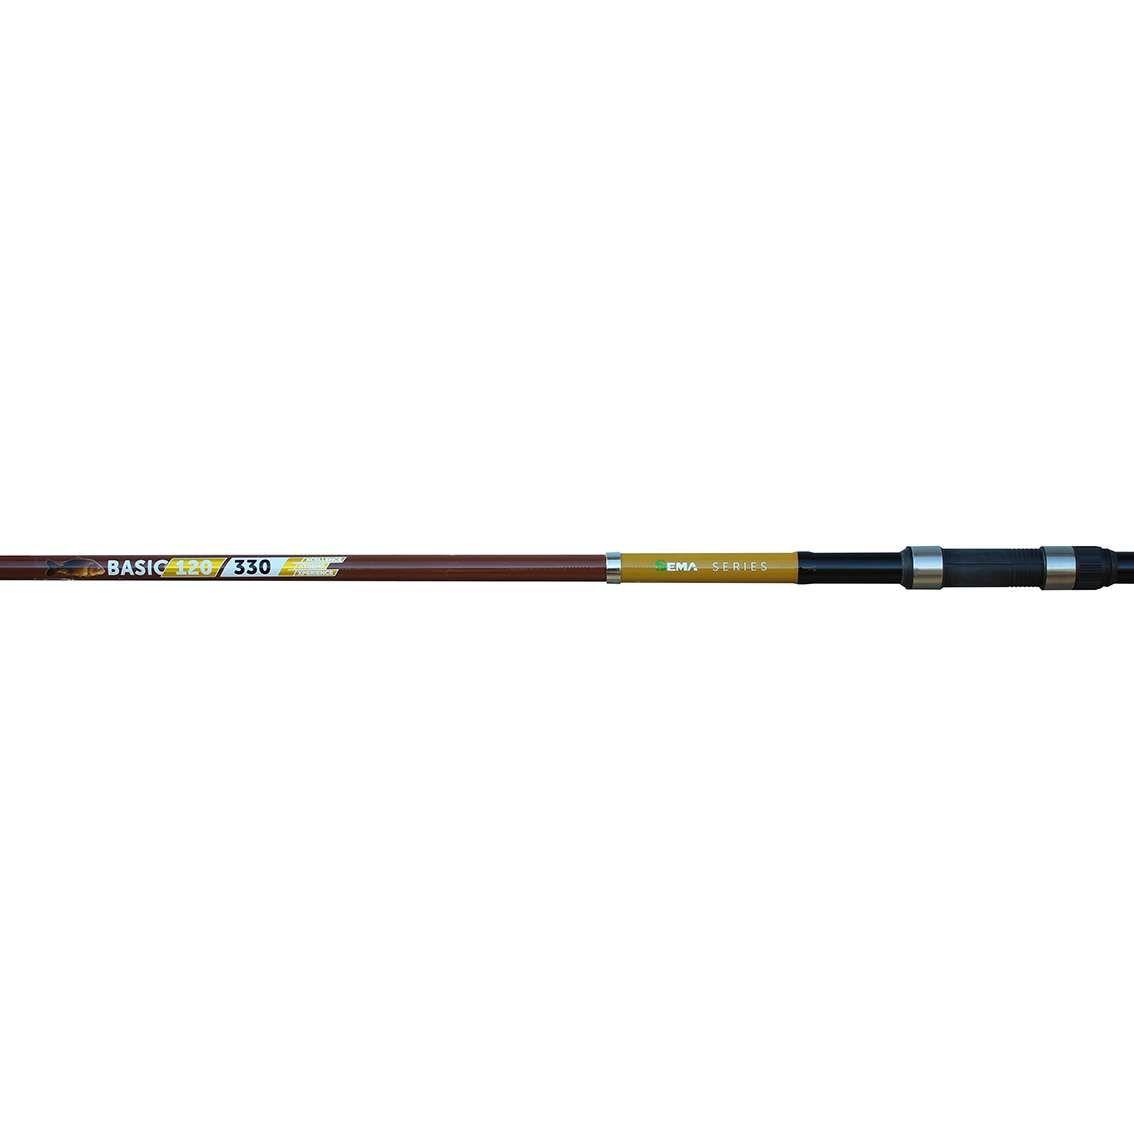 Rybársky prút Sema Basic Tele 3m 30-60g